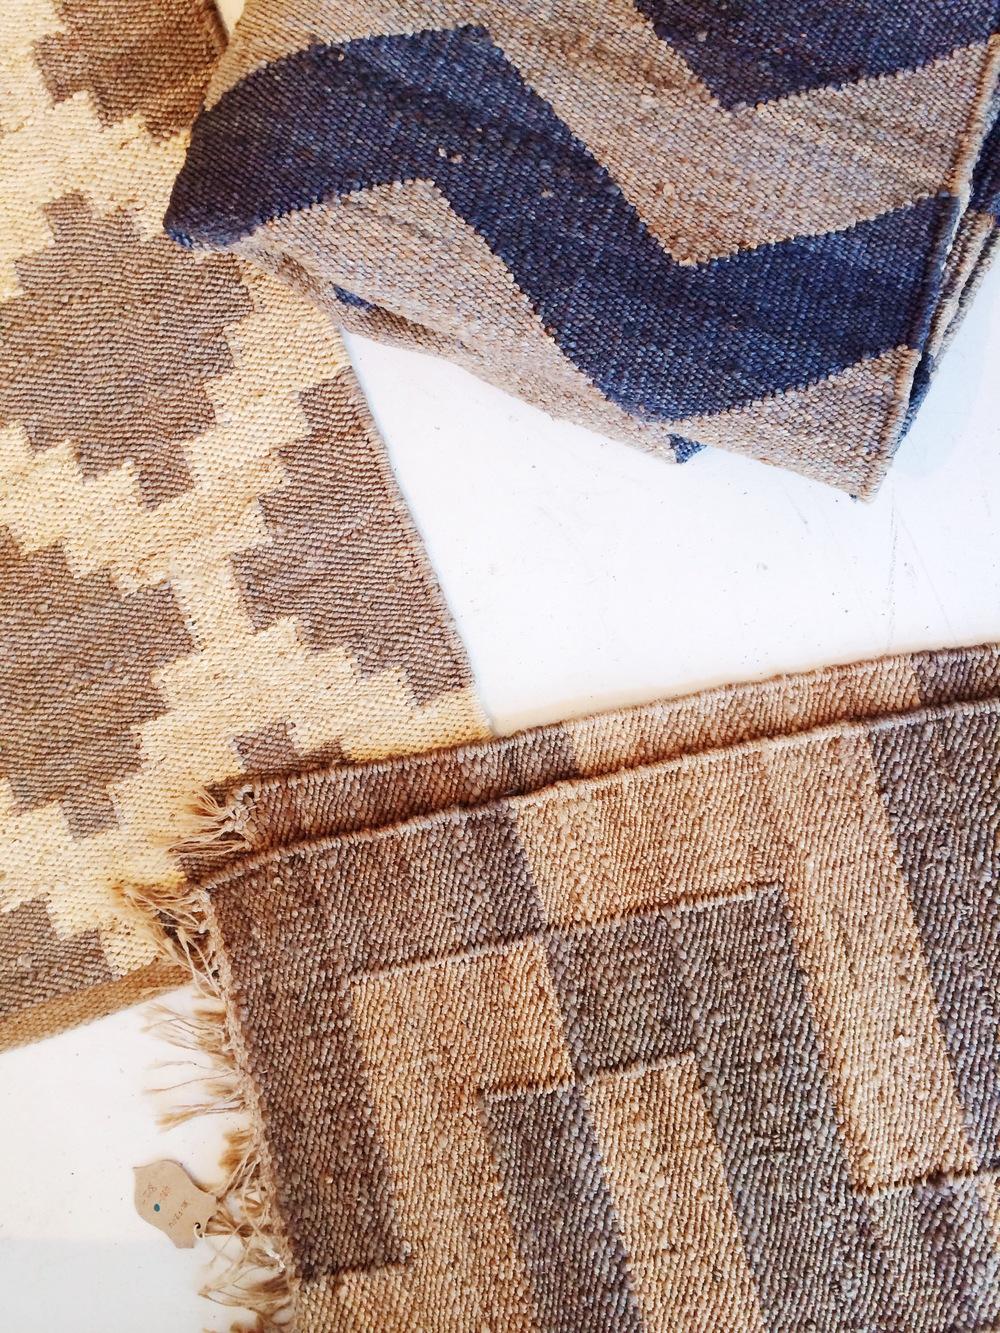 indianapolis rugs haus love